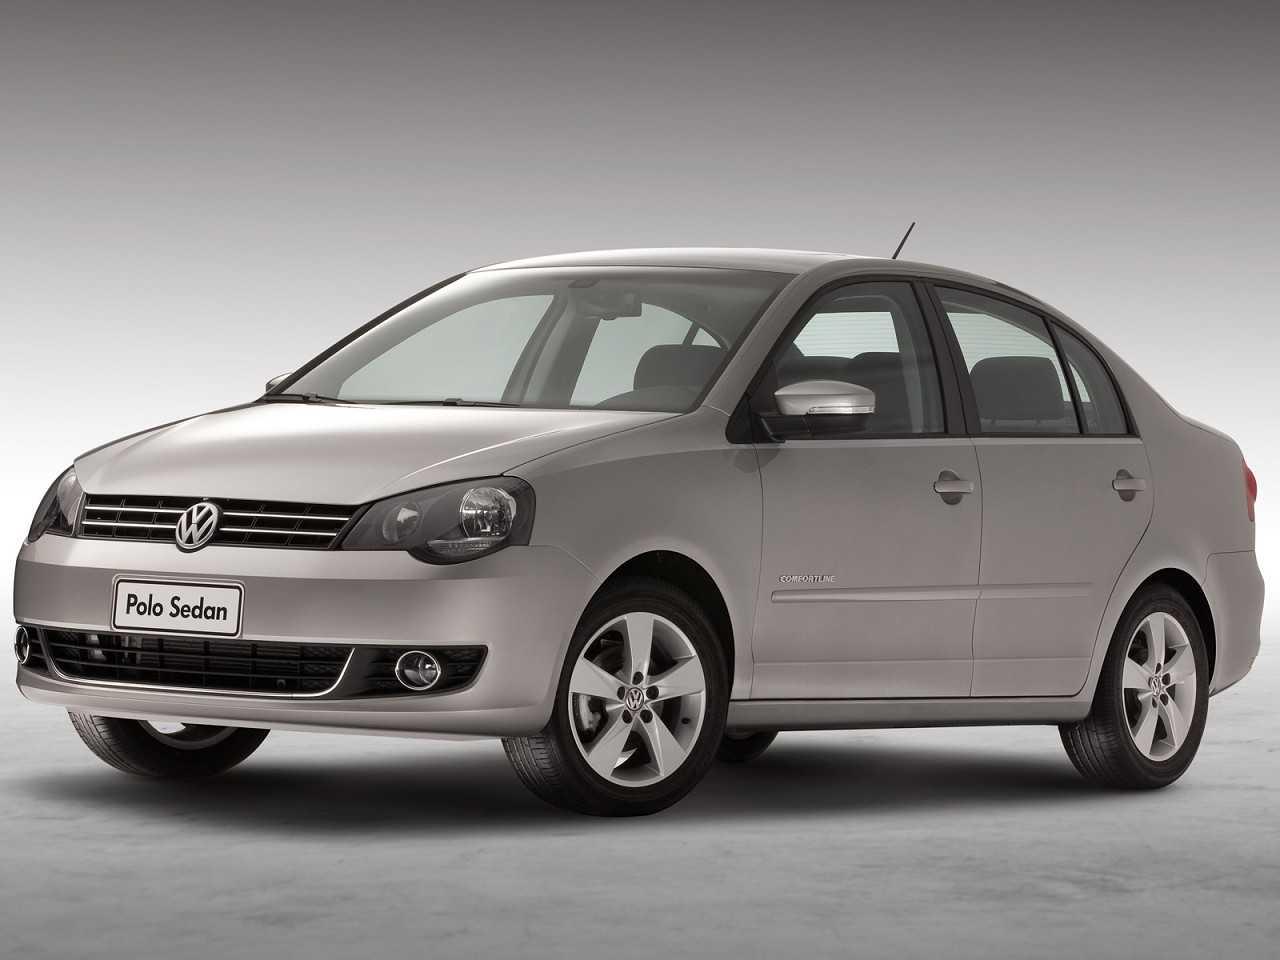 VolkswagenPolo Sedan 2014 - ângulo frontal